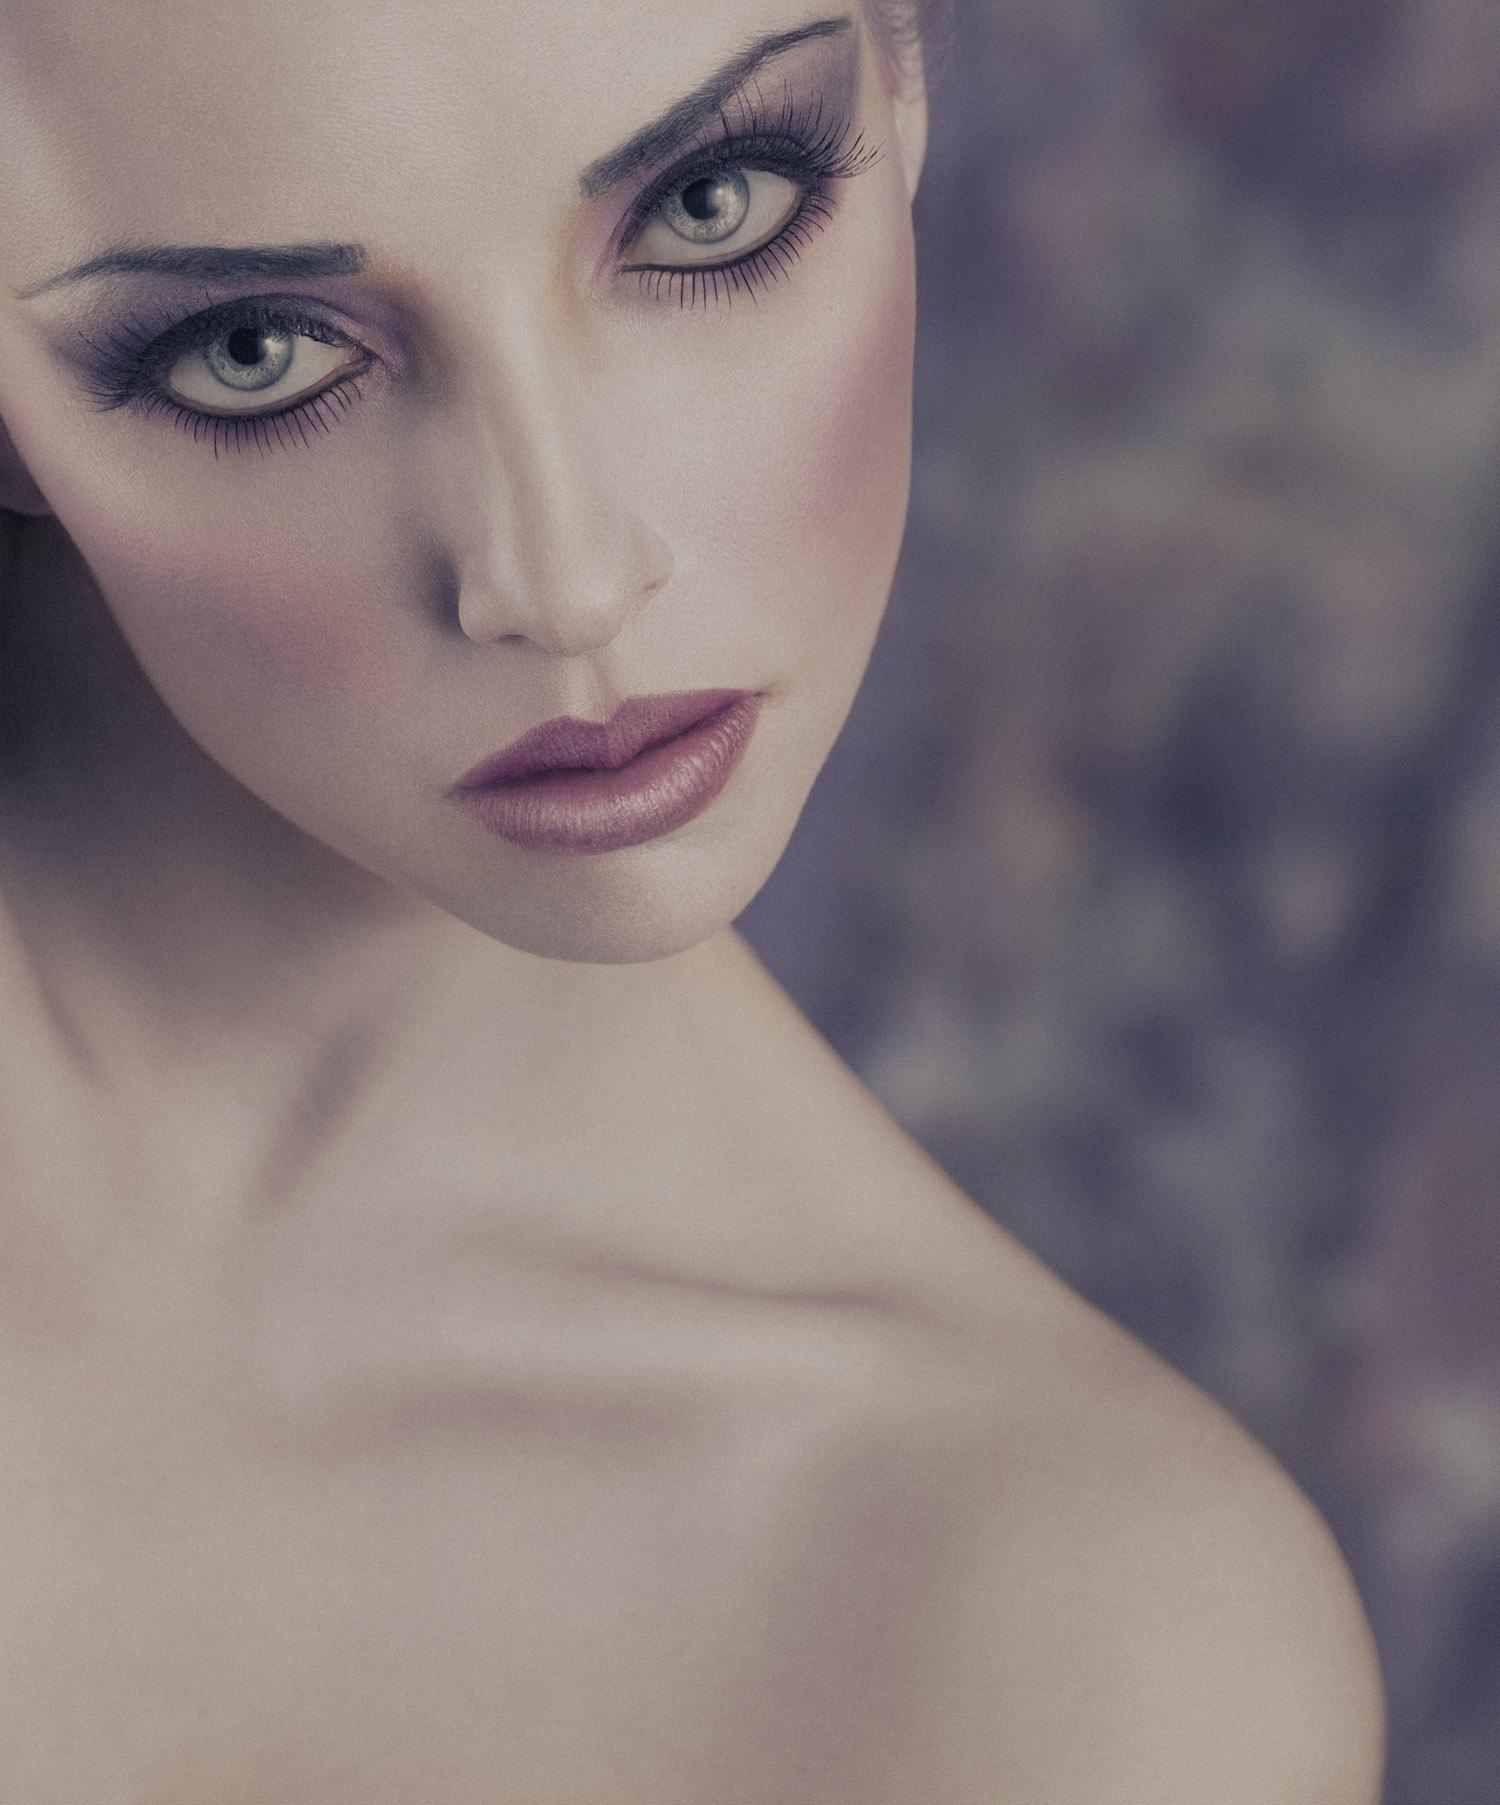 Joseph_Alexander_Beauty_05.jpg